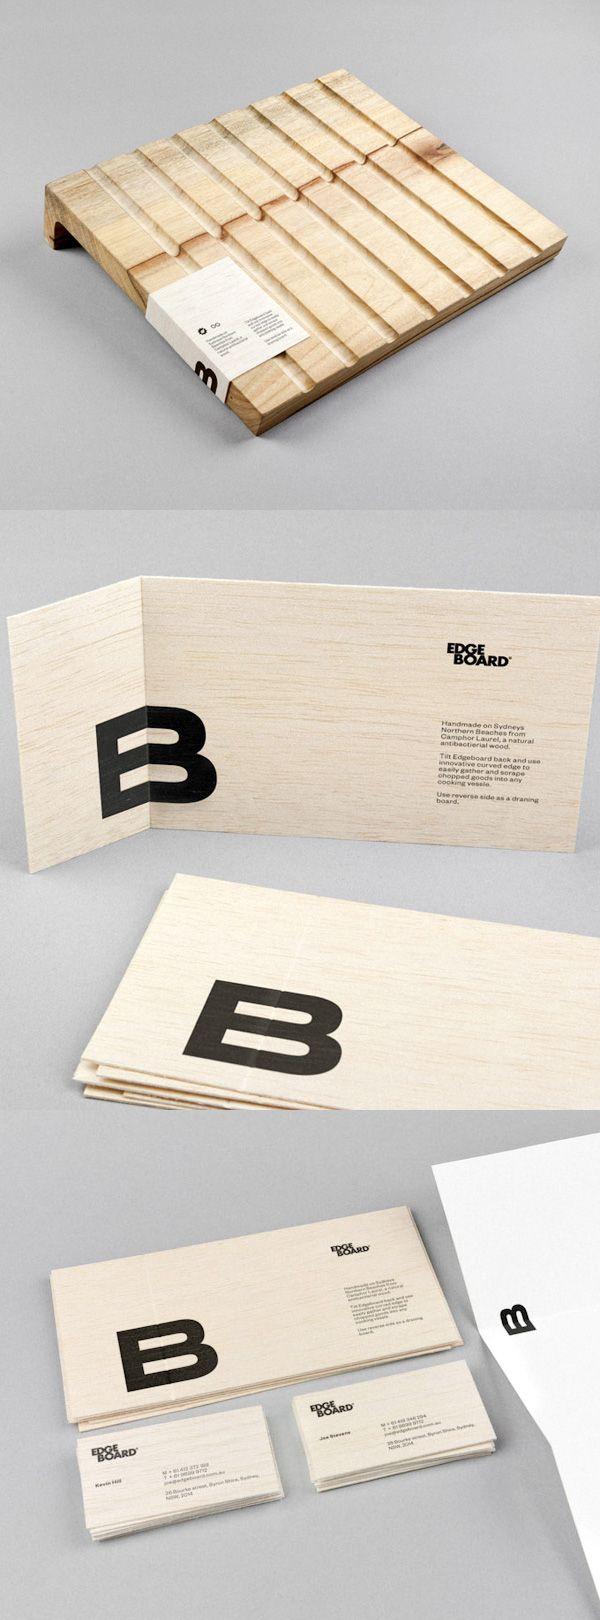 EdgeBoard's Minimalist Business Card & Branding